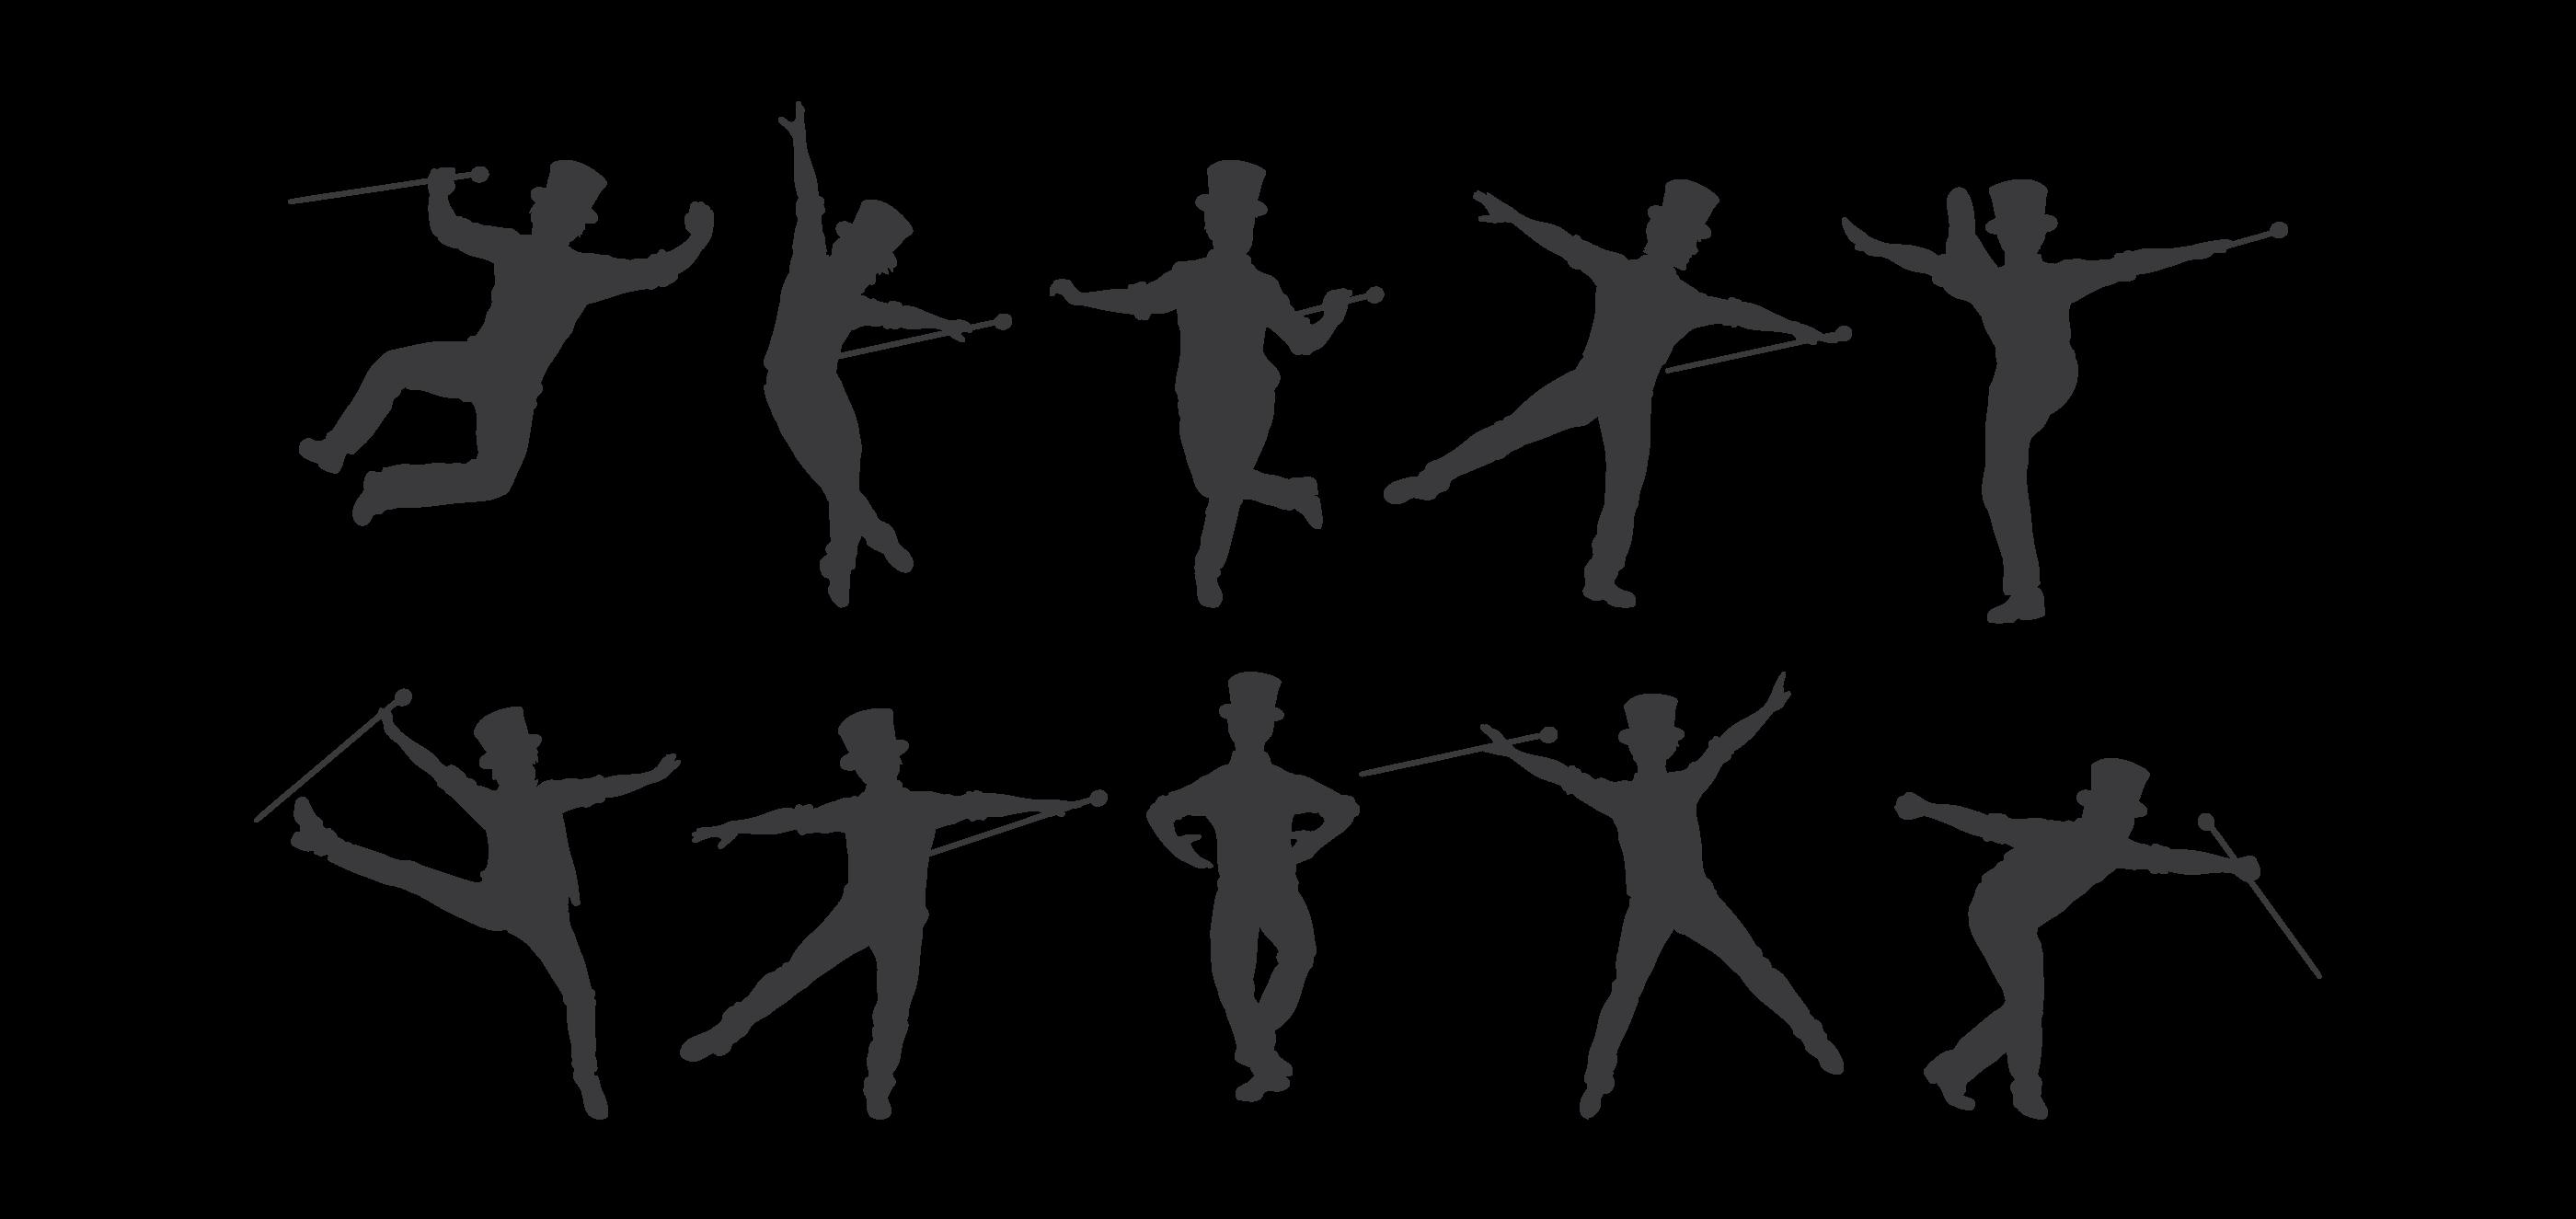 tap dance silhouettes vector download free vector art ballet dancer clipart images ballet dancer clip art color